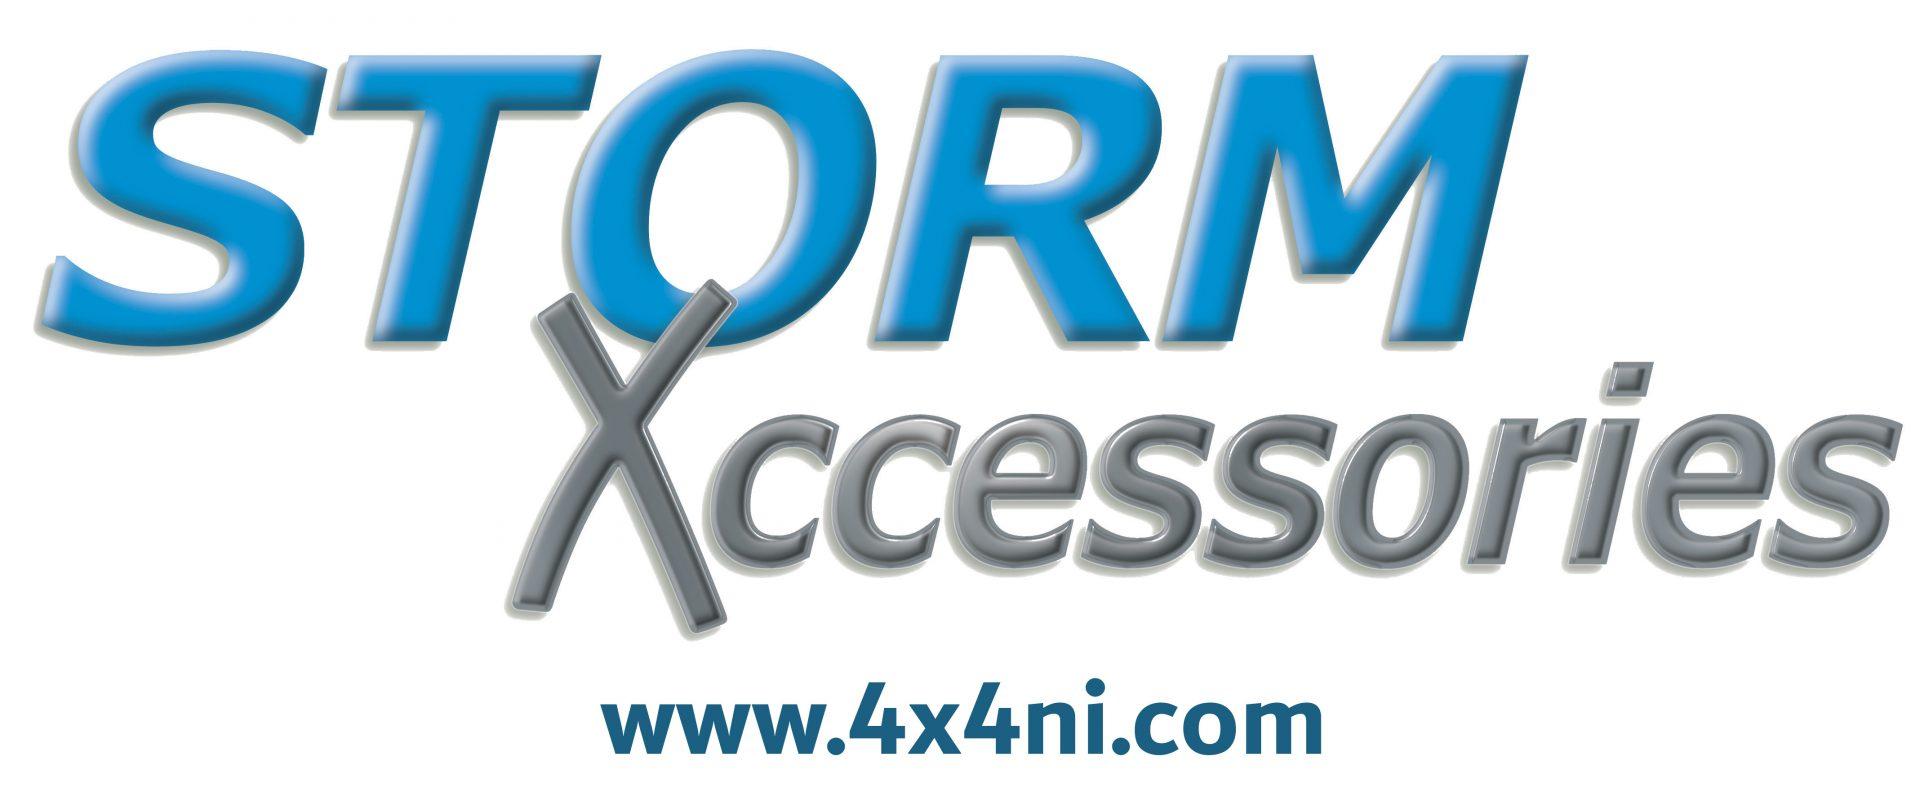 Storm logo with website